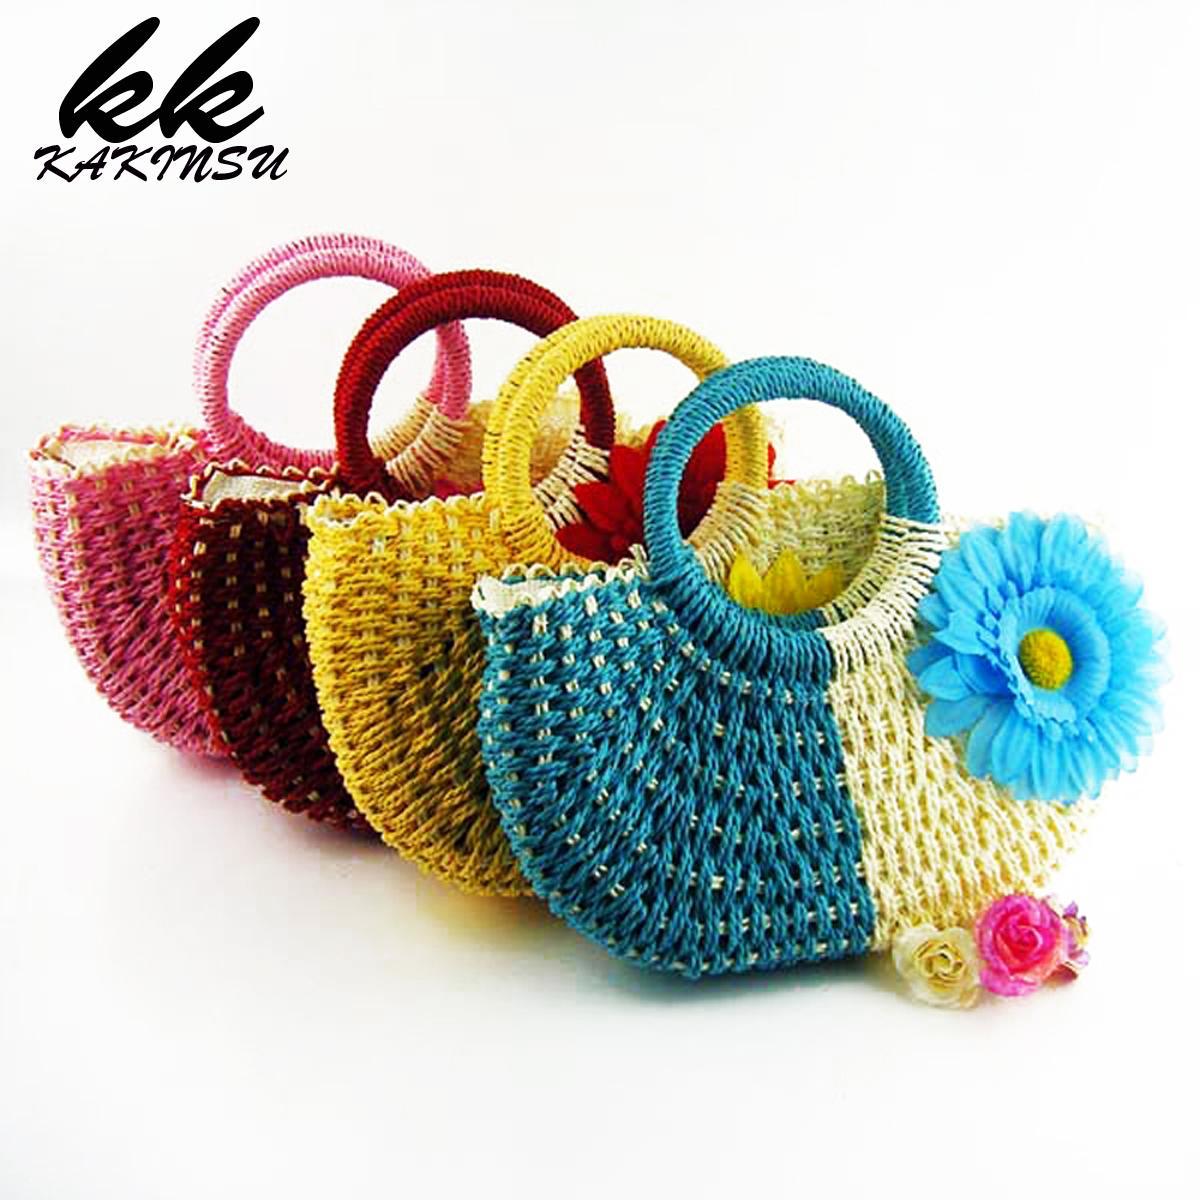 Straw Bags Woven Women's Handbags Designer Beach Weaving Bag Summer Travel Totes Ladies Handbag Knitting Shopping Handmade Bag